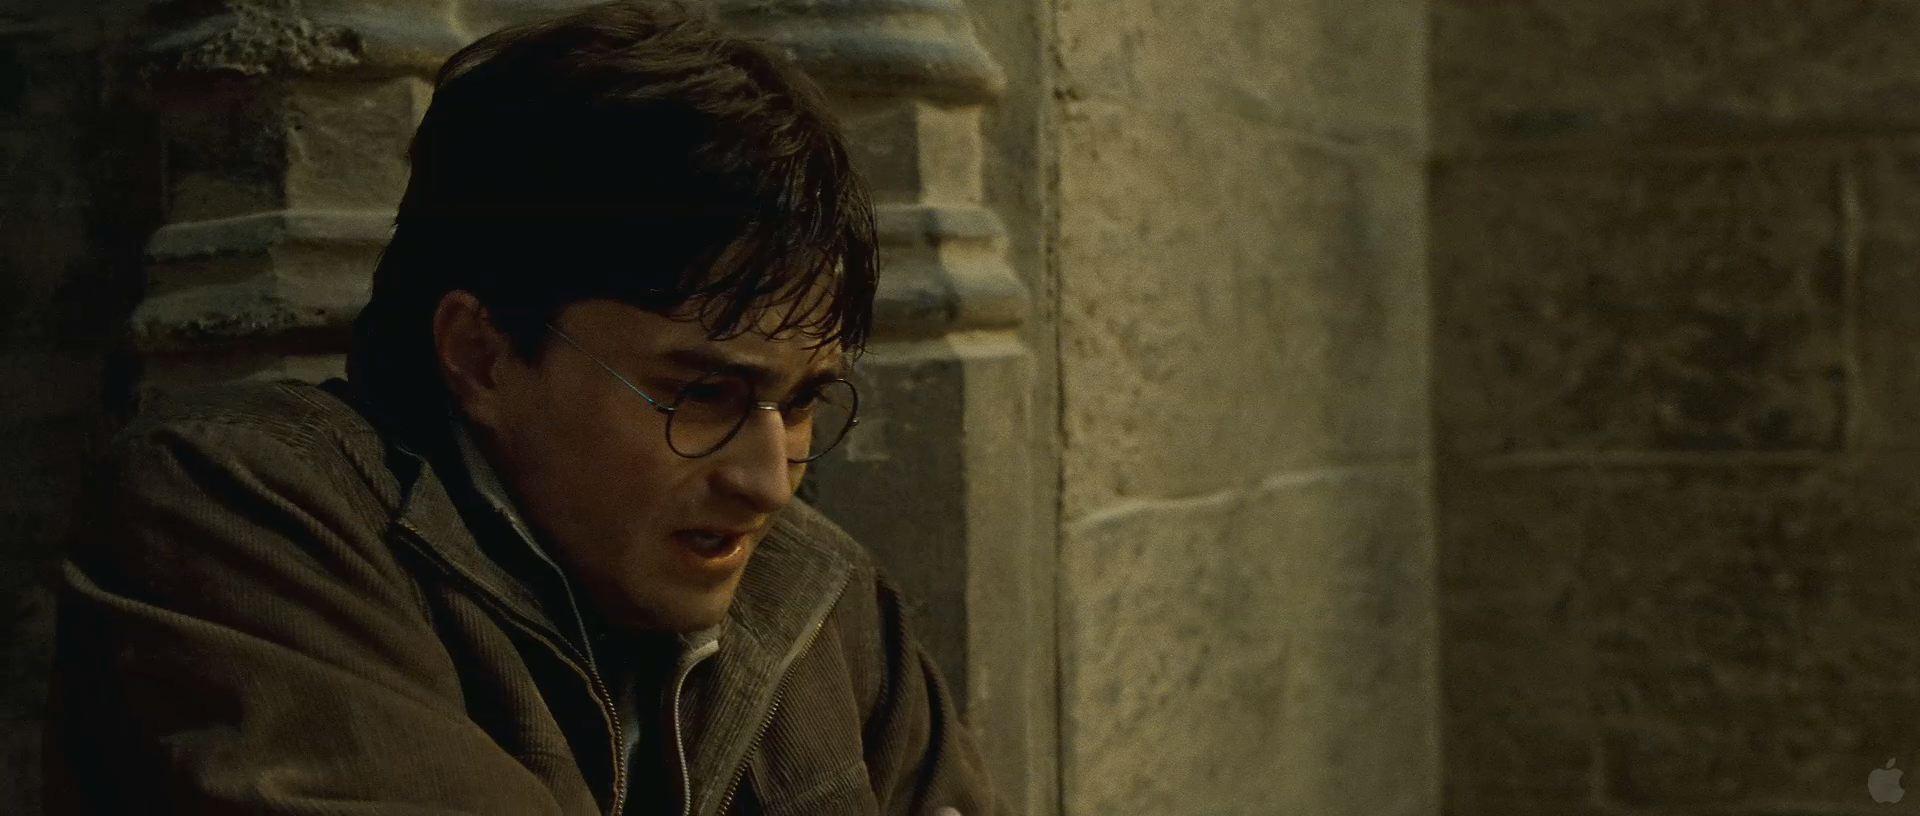 Harry Potter BlogHogwarts HP7 2 Trailer 45